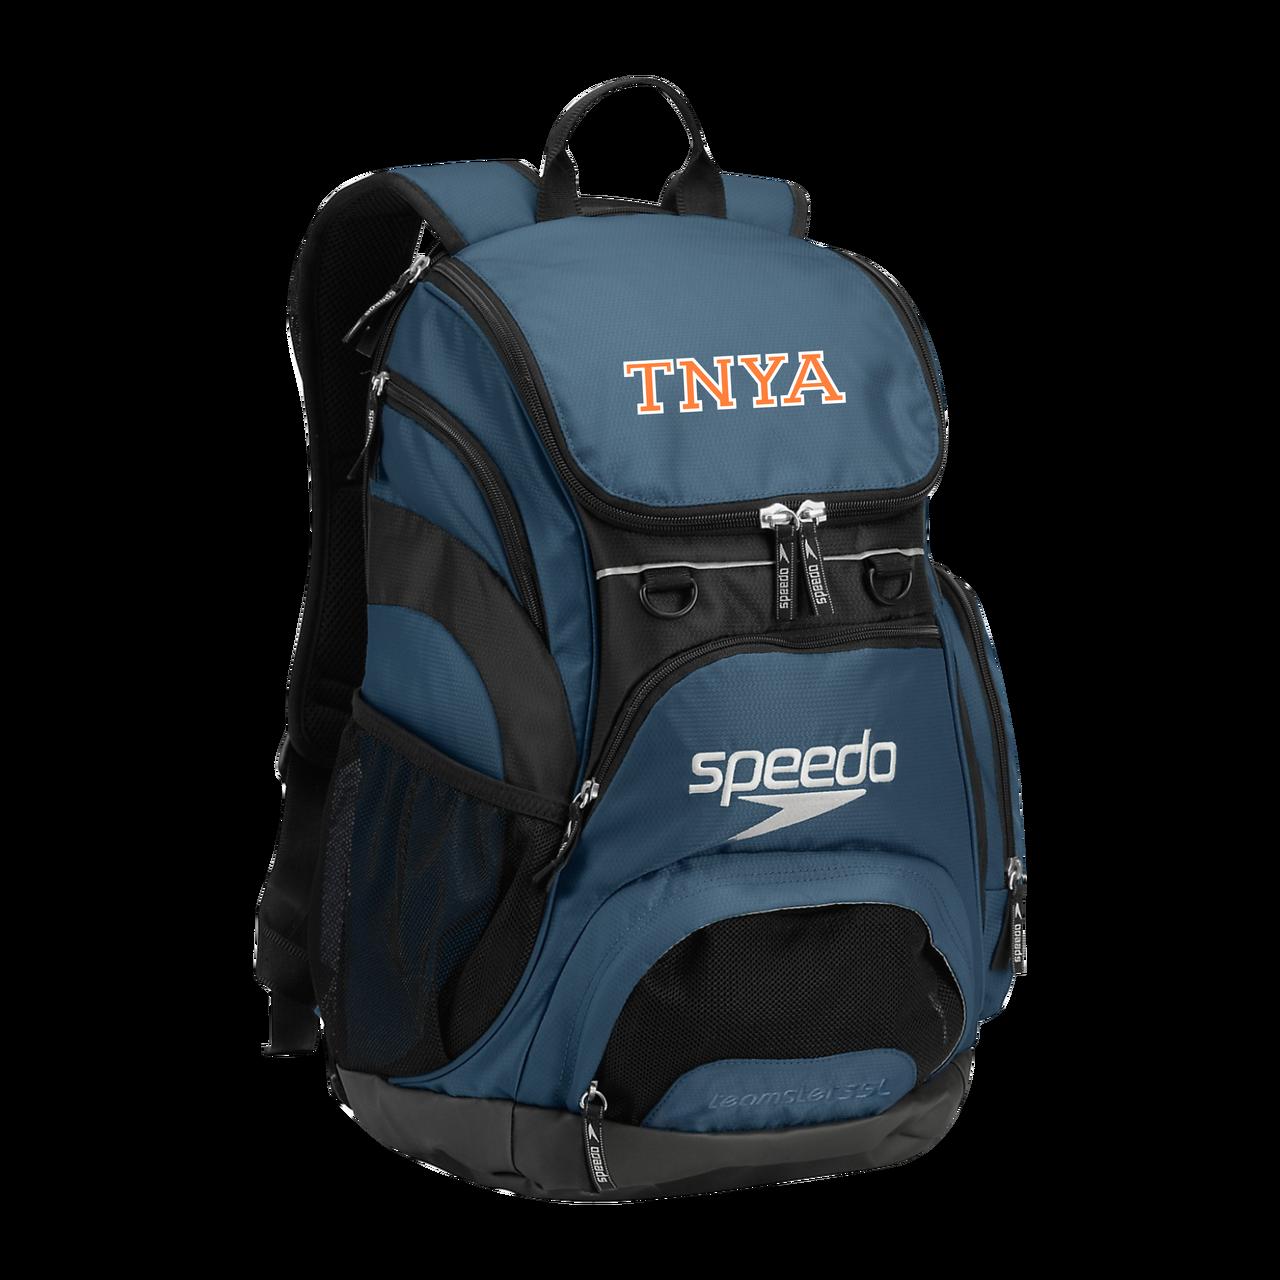 6691c1a1b1 Speedo Teamster Backpack- TNYA - California Beach Hut